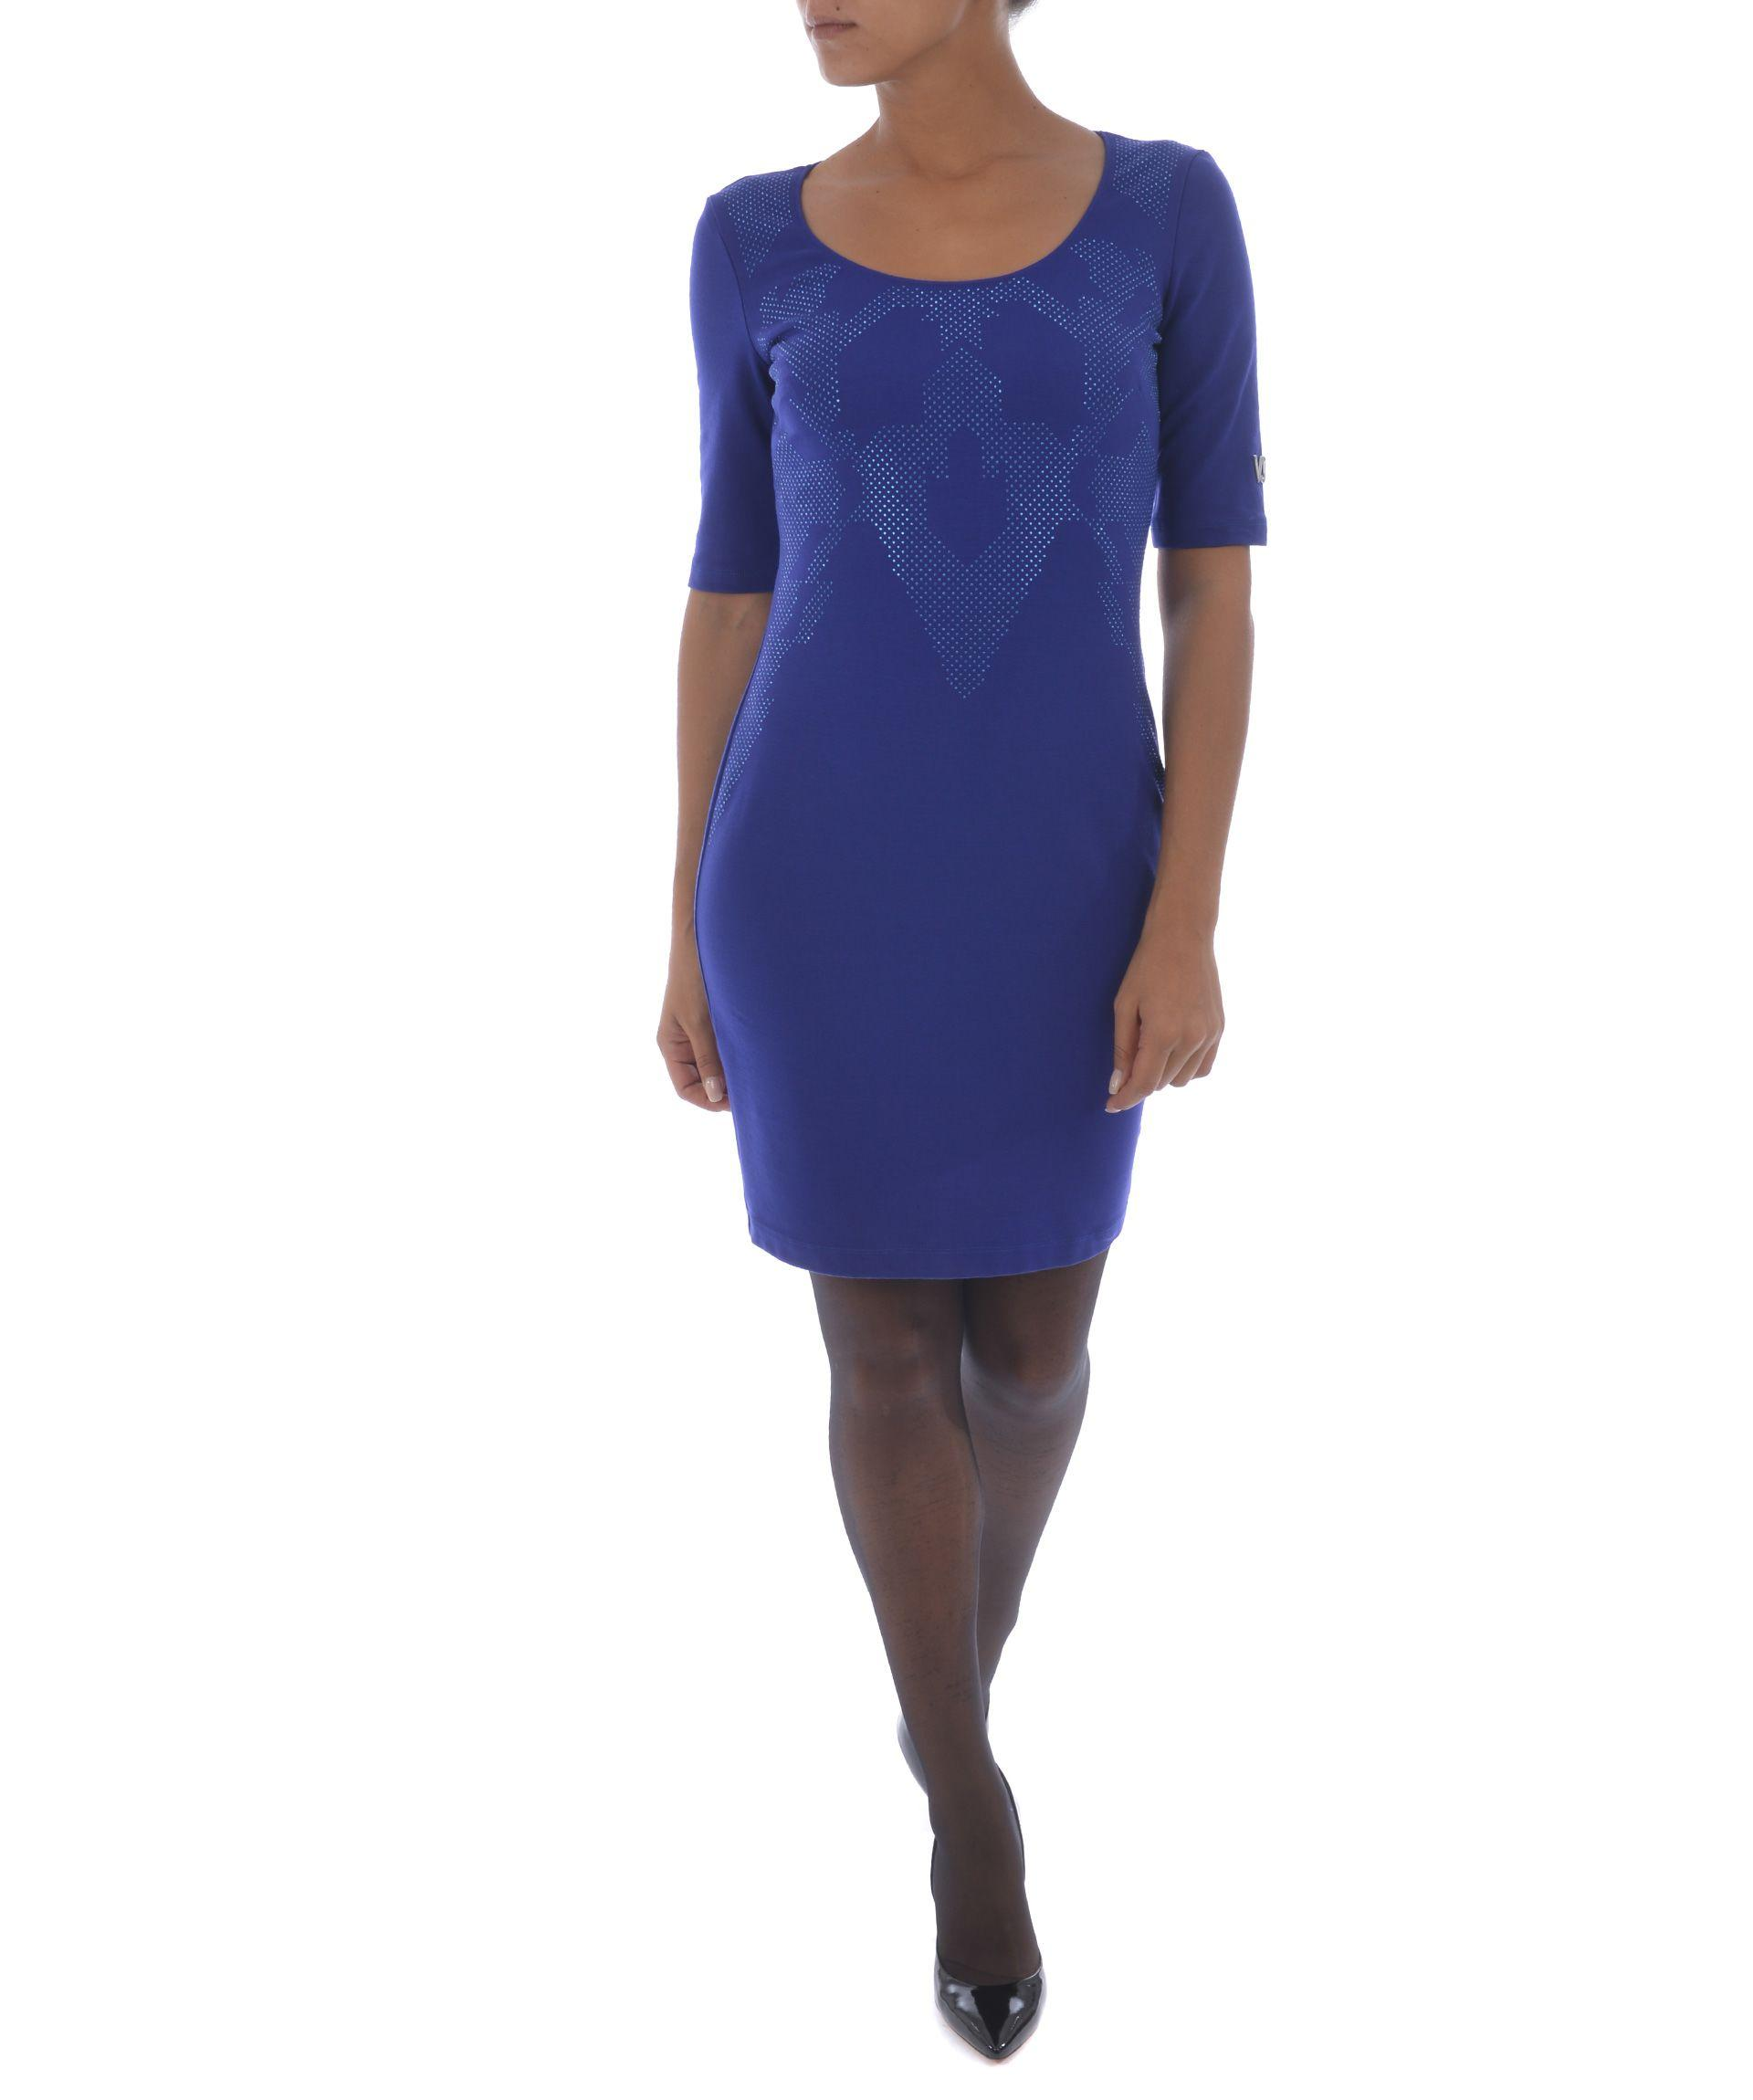 Versace Micro Embellished Dress In Blu Cobalto